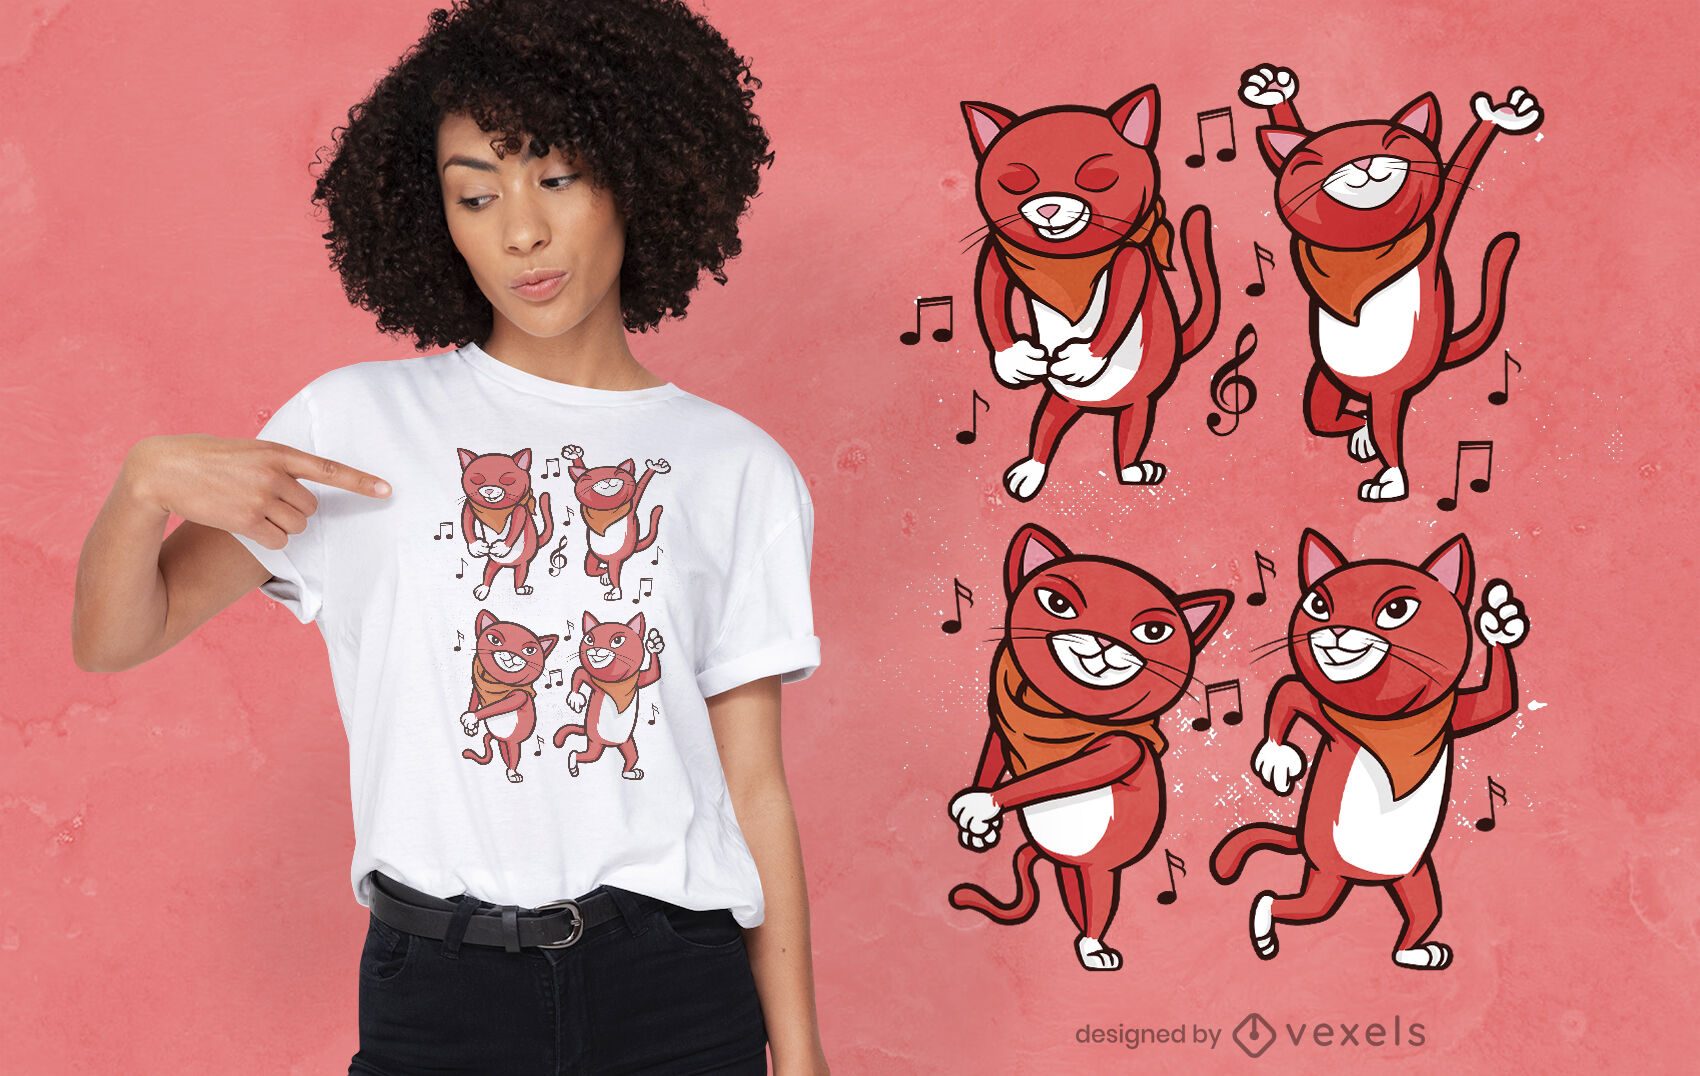 Dancing cats t-shirt design